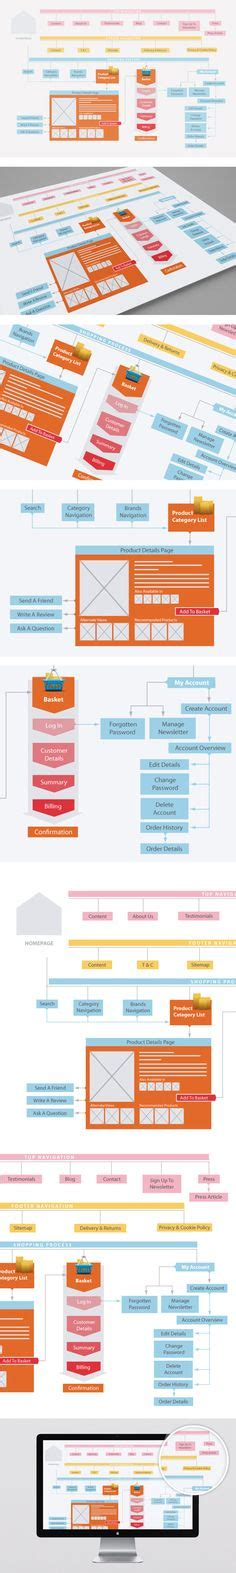 website structure images website structure